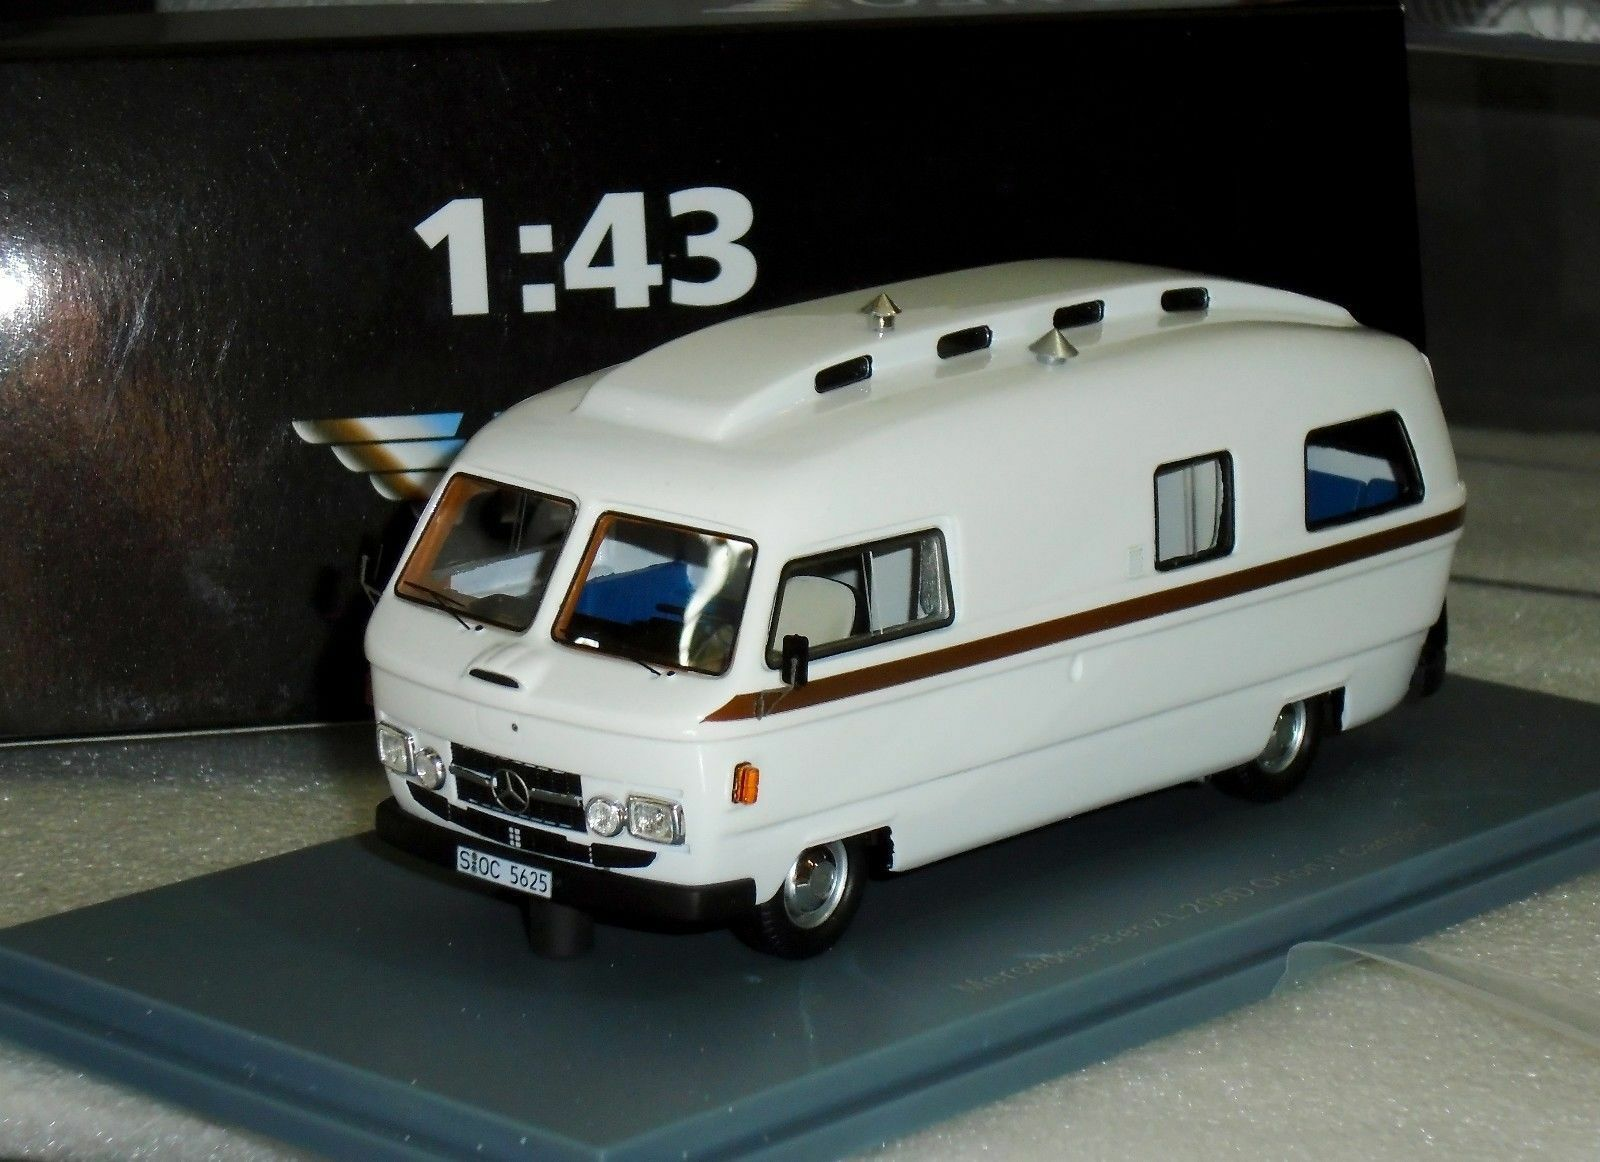 hasta un 60% de descuento Mercedes Benz L206D Orion Orion Orion II Camper AutoCocheavana Neo 45625 1 43  Envío 100% gratuito